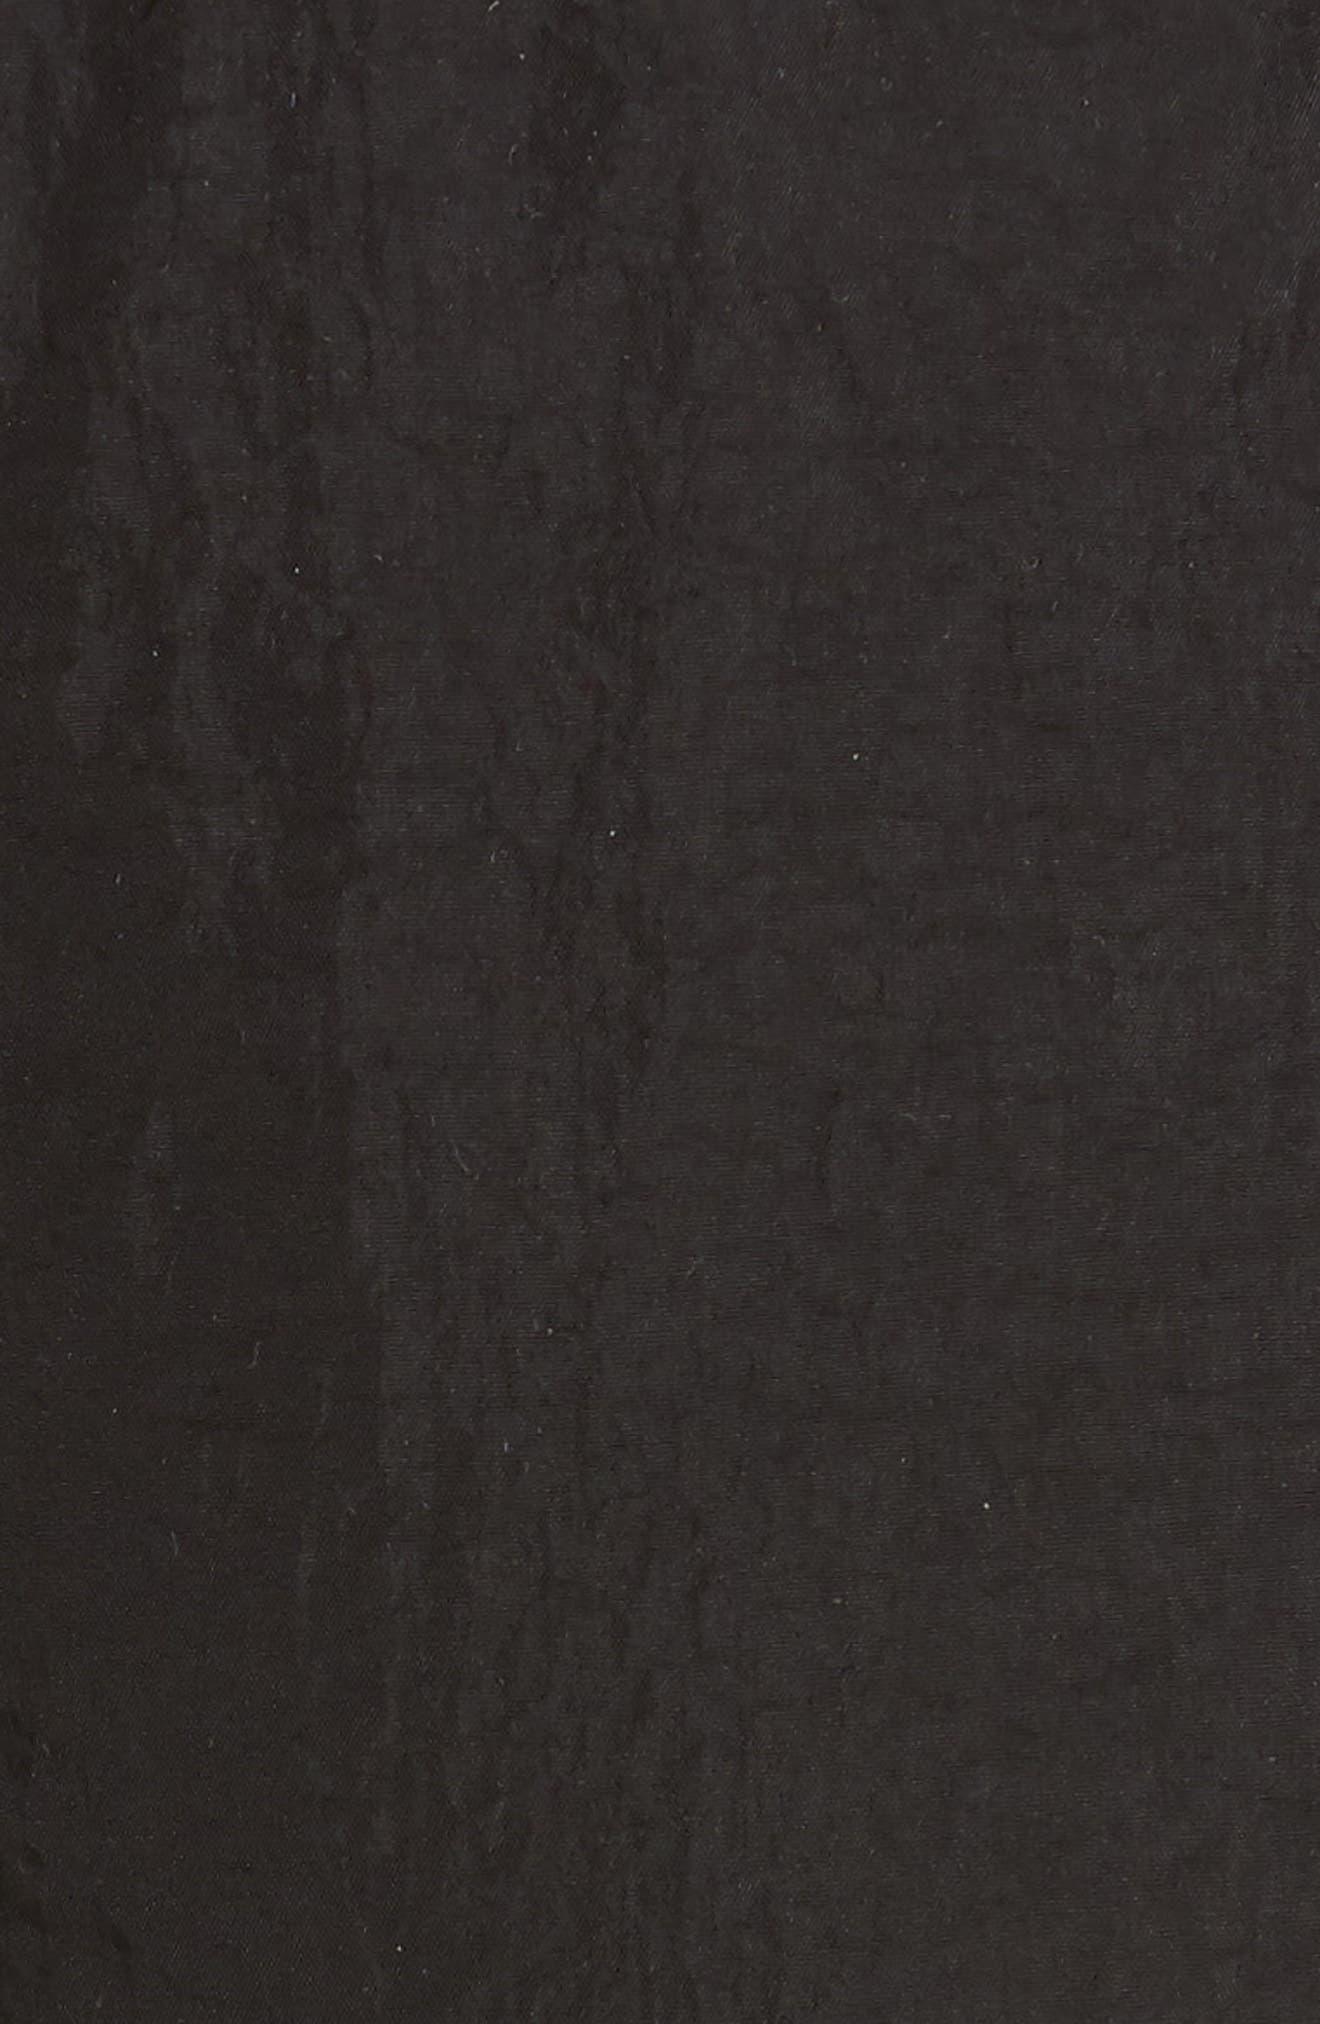 PROENZA SCHOULER, PSWL Drawstring Waist Parachute Pants, Alternate thumbnail 5, color, BLACK